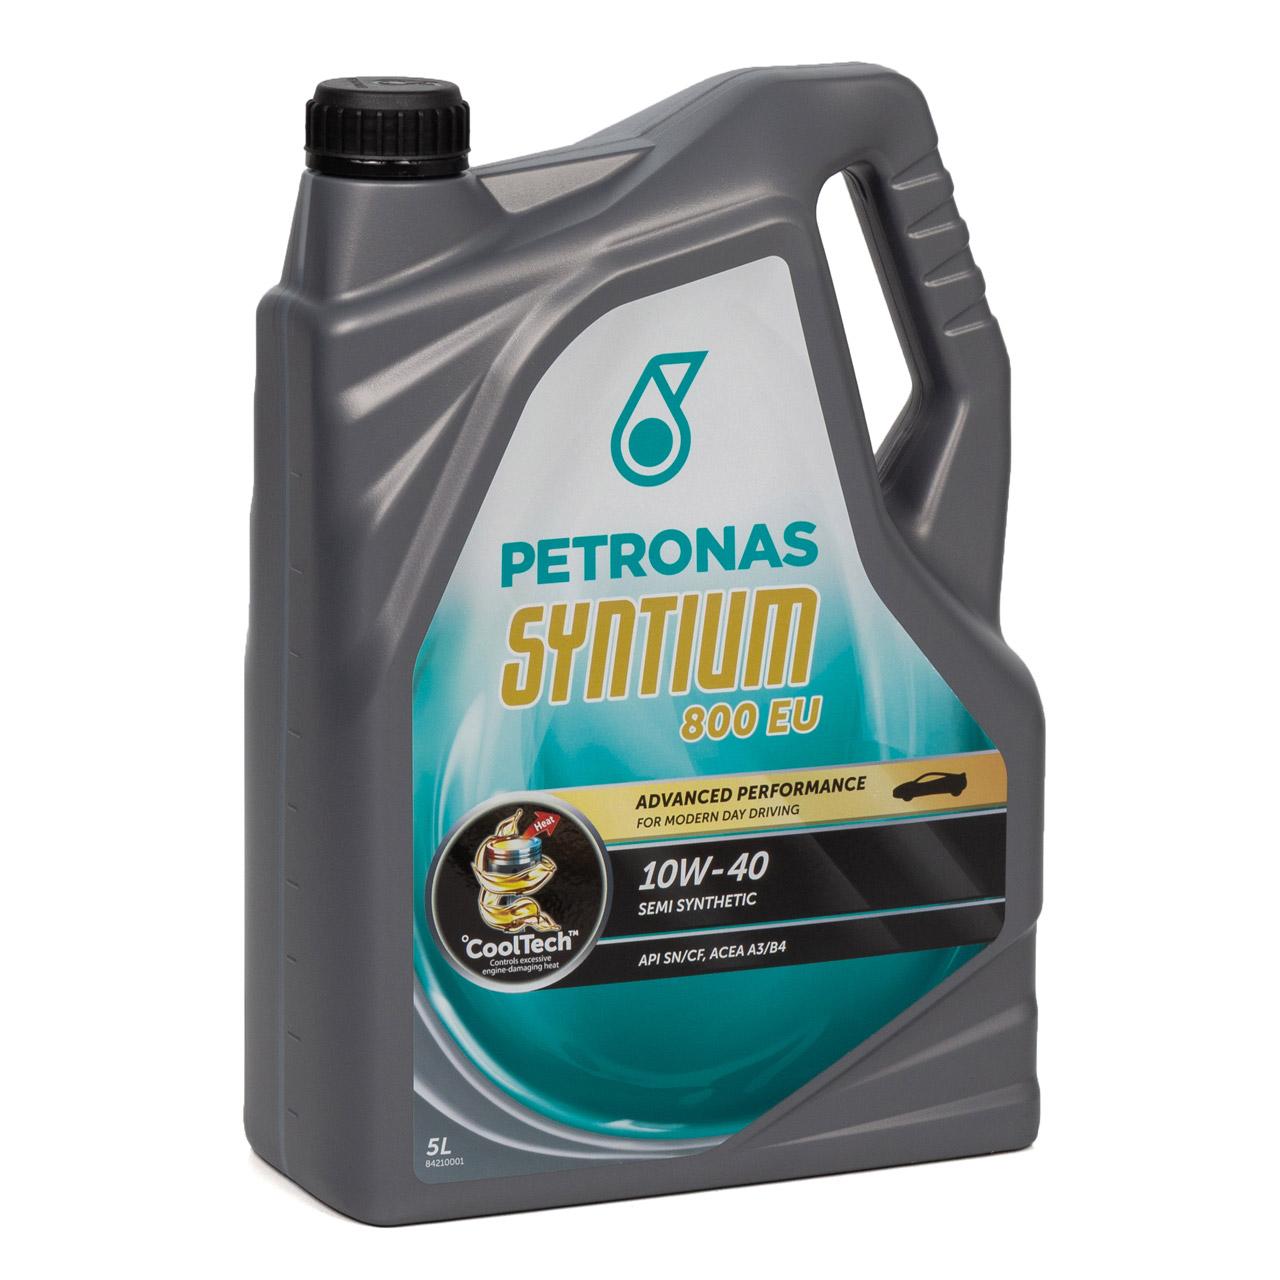 PETRONAS Syntium 800 EU Motoröl Öl 10W40 5L 5Liter MB 229.1 ACEA A3/B4 API SN/CF